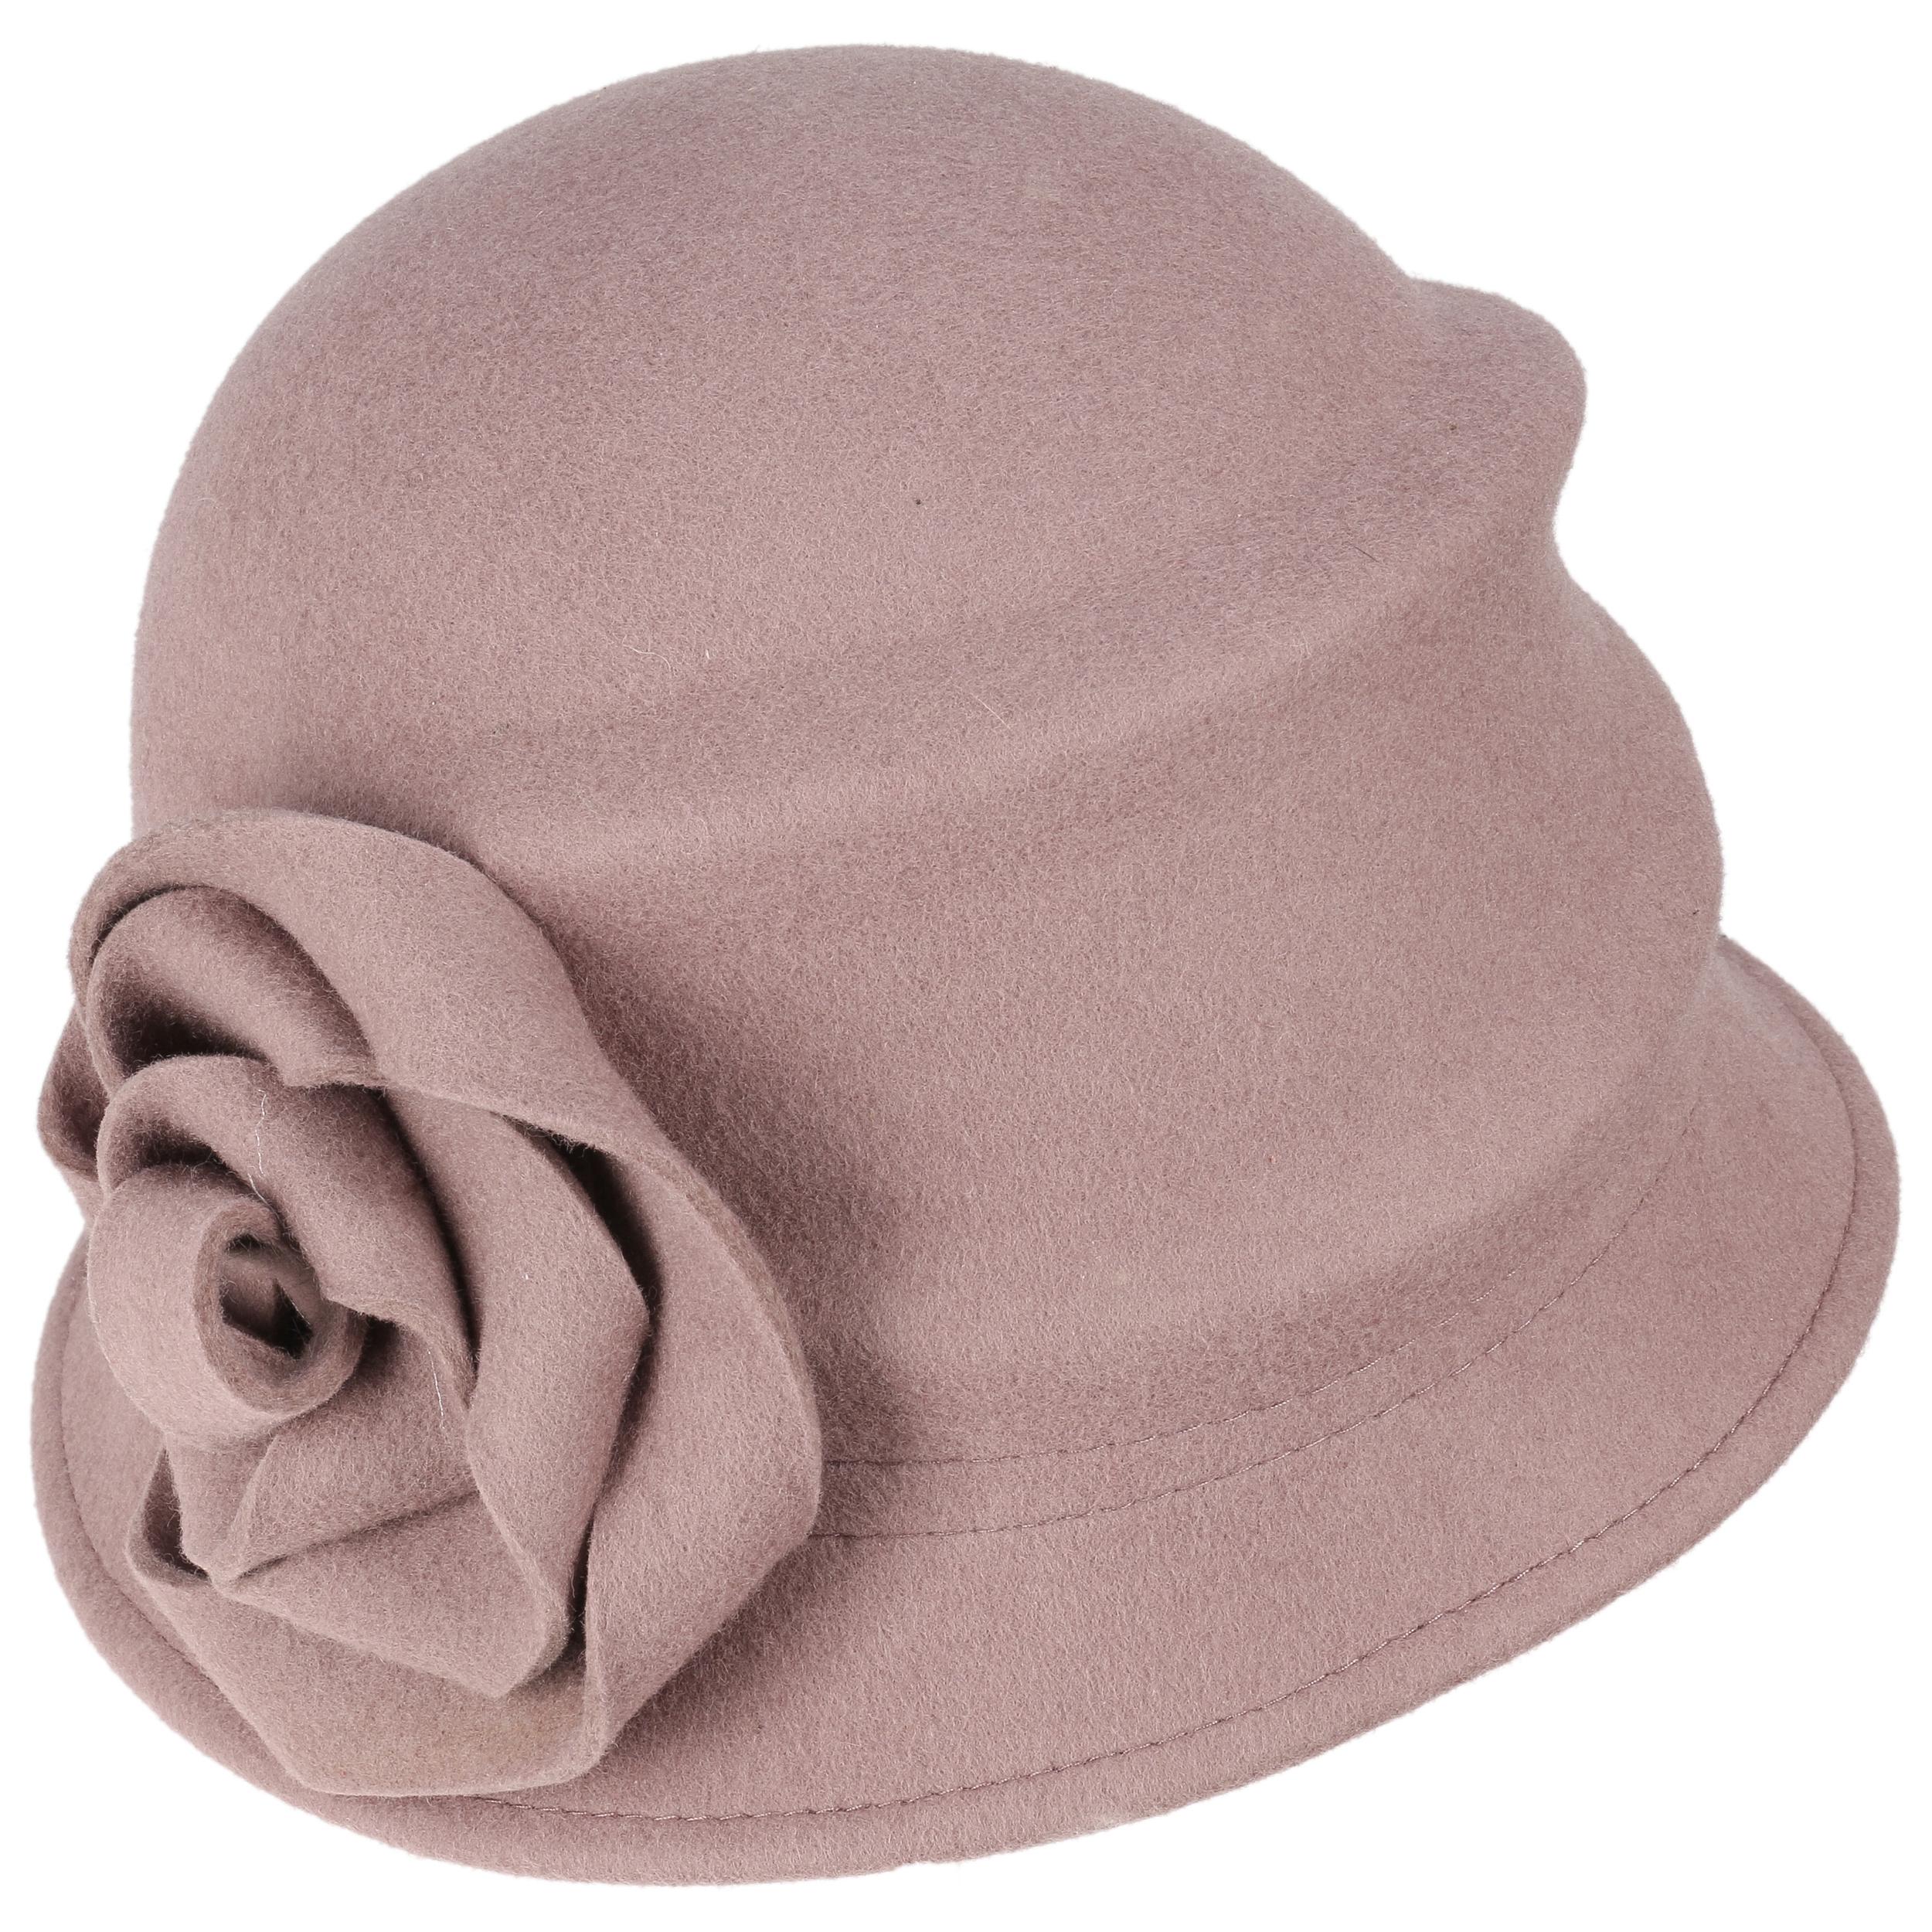 0f66508569a64 Sombrero Cloché Alexandrite by Betmar - Sombreros - sombreroshop.es